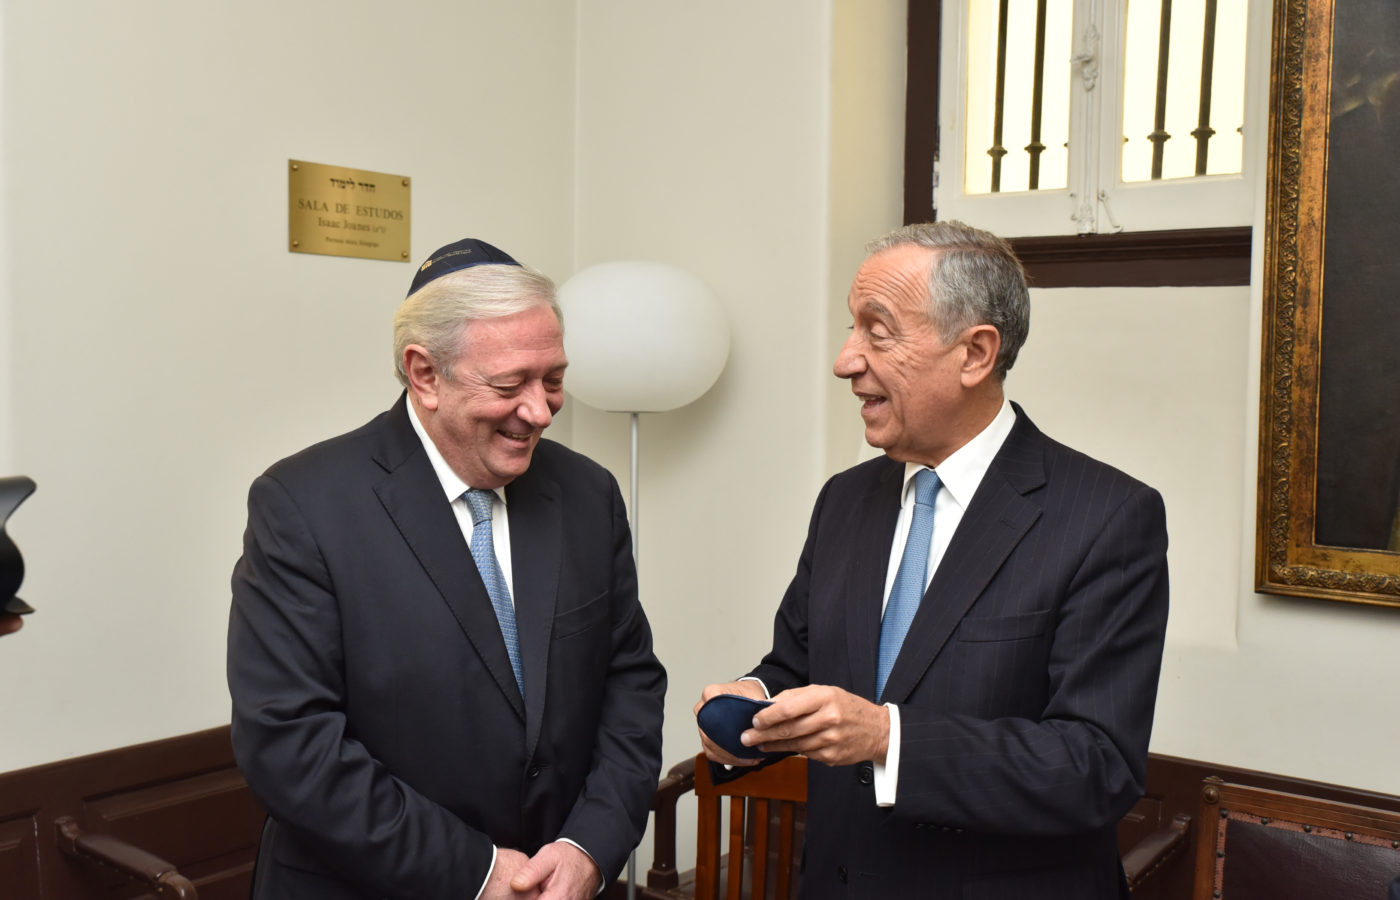 evento-sinagoga-134